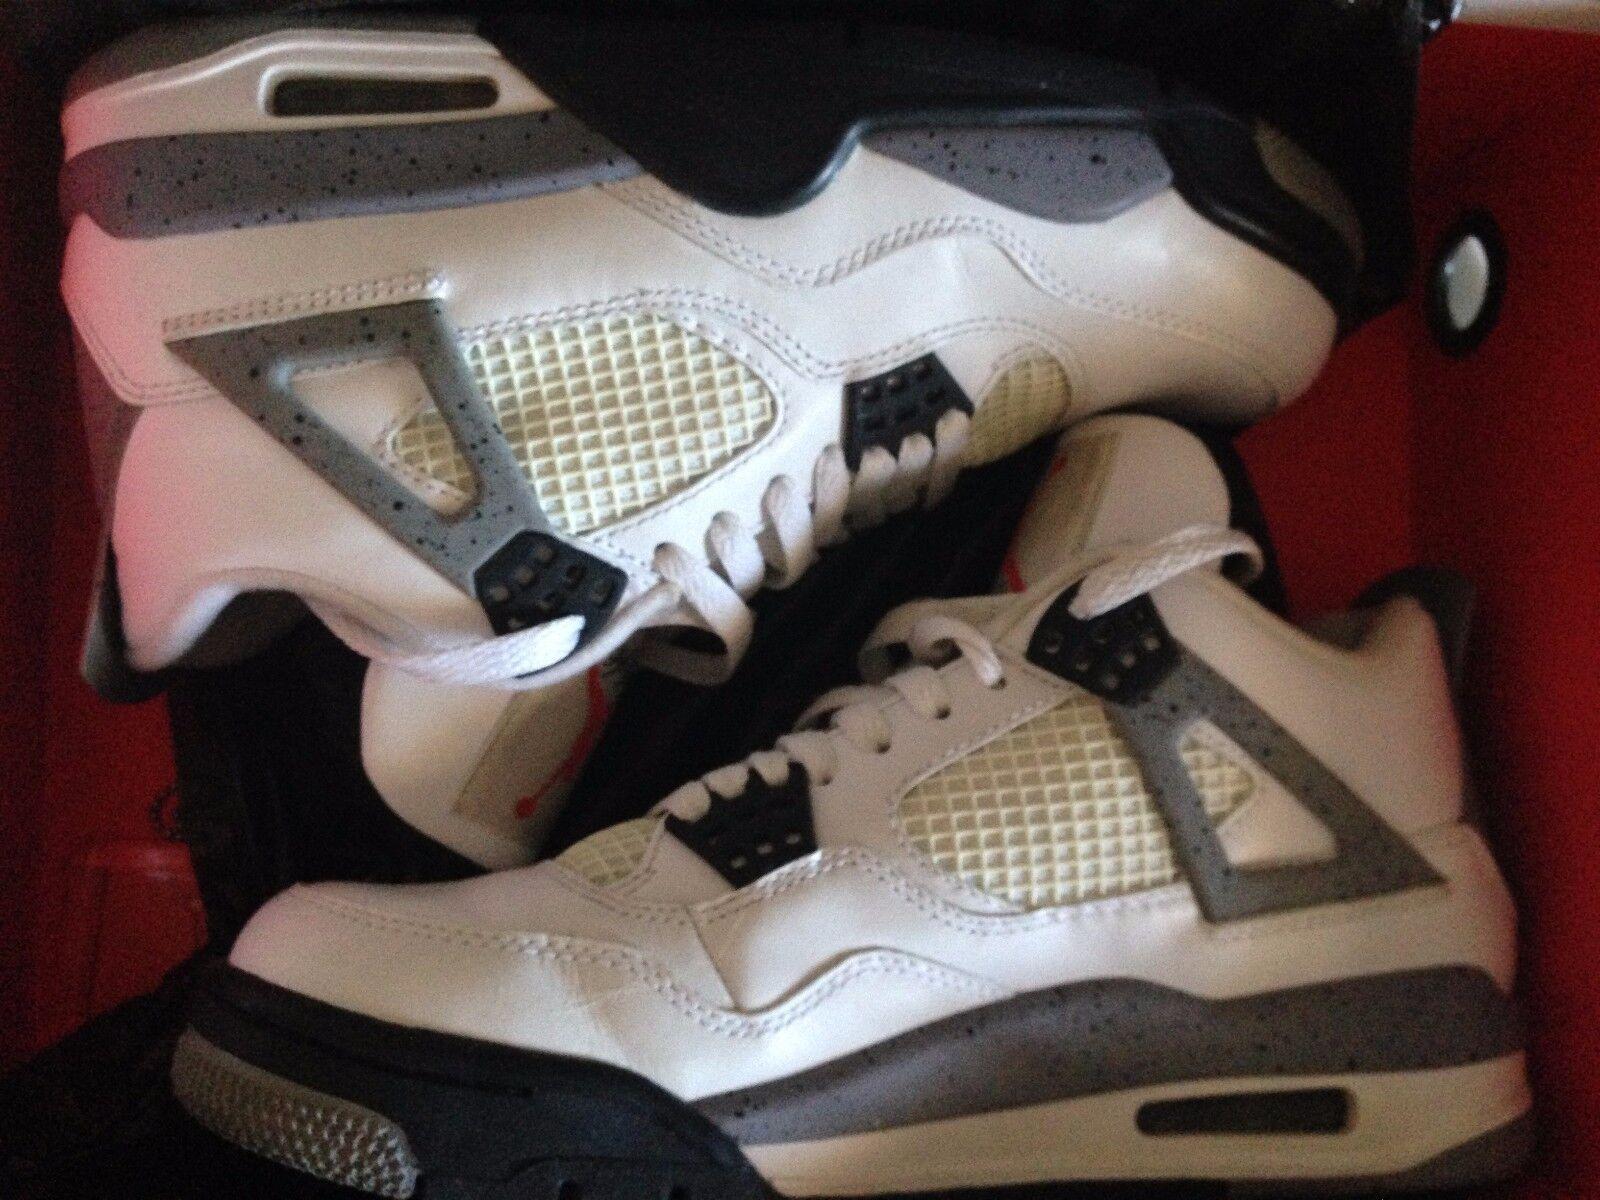 Nike air jordan 4 retro bianco / nero di cemento grigio 308497 103 39 noi